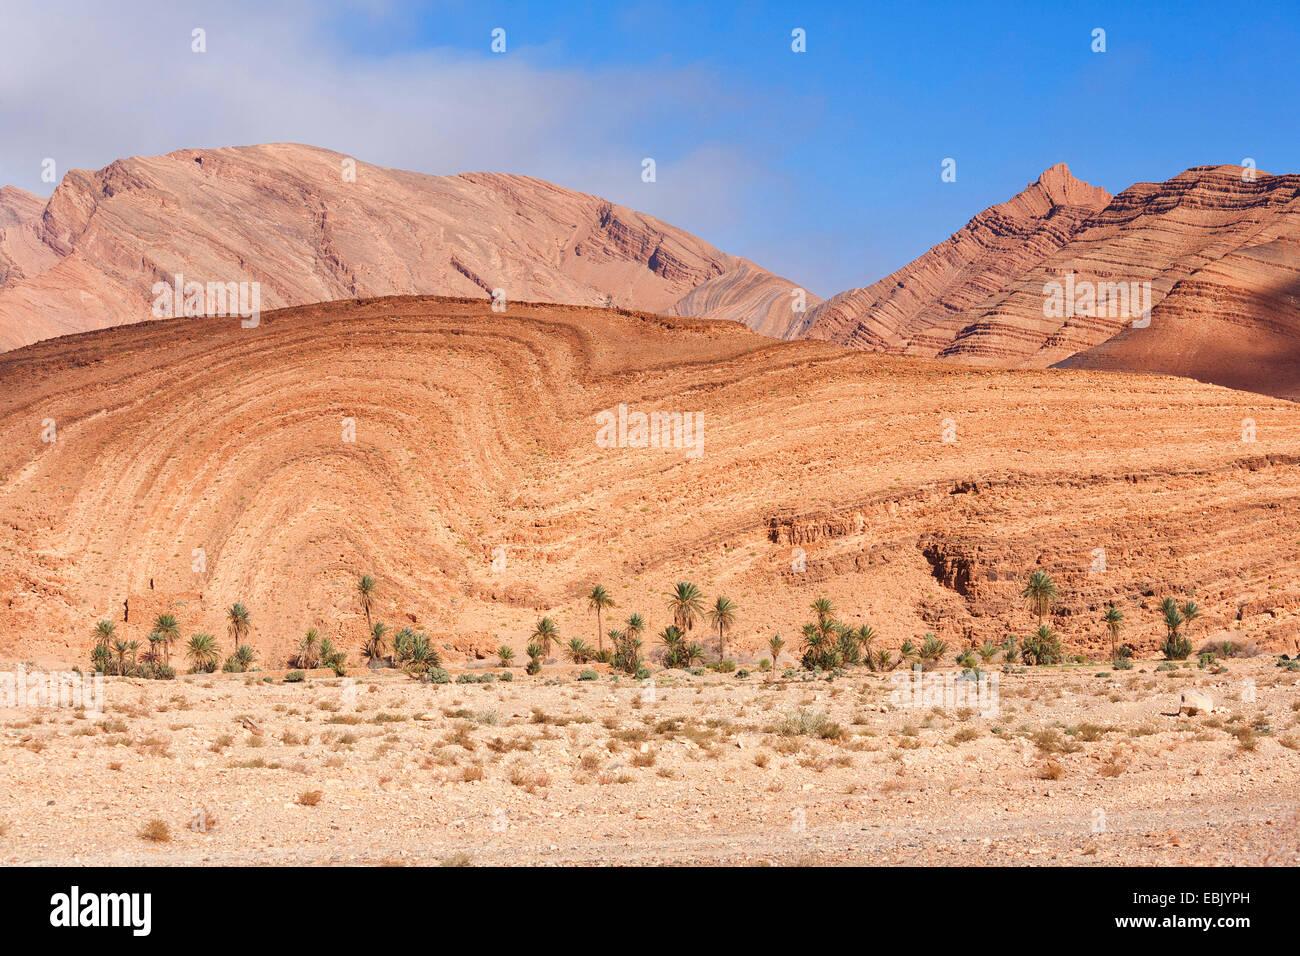 folds at mountain slope near Tata in South Morocco, Morocco, Antiatlas, Tata - Stock Image